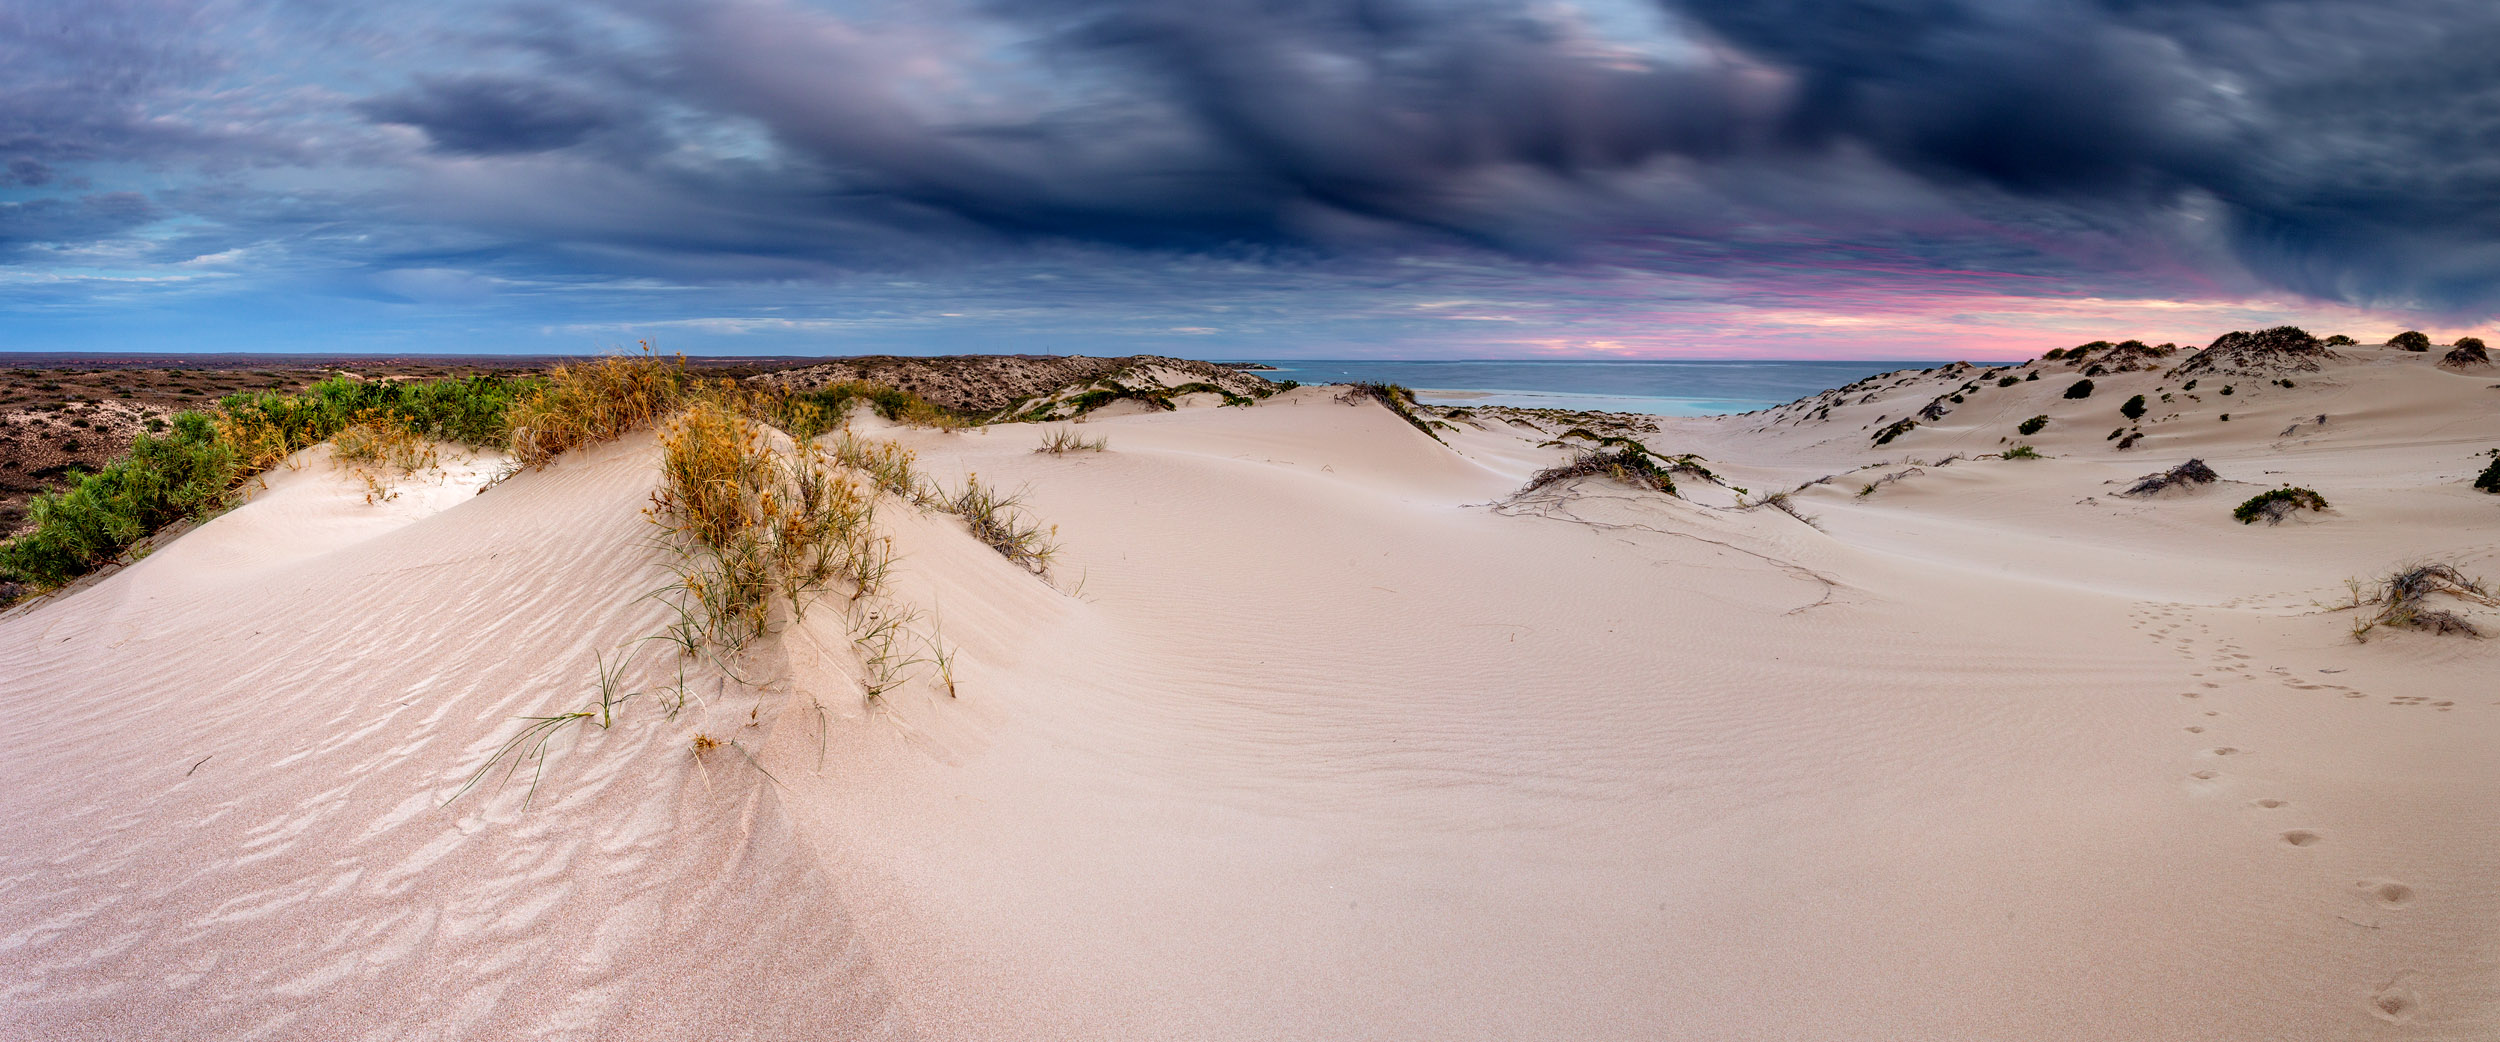 coral-bay-sand-dunes.jpg